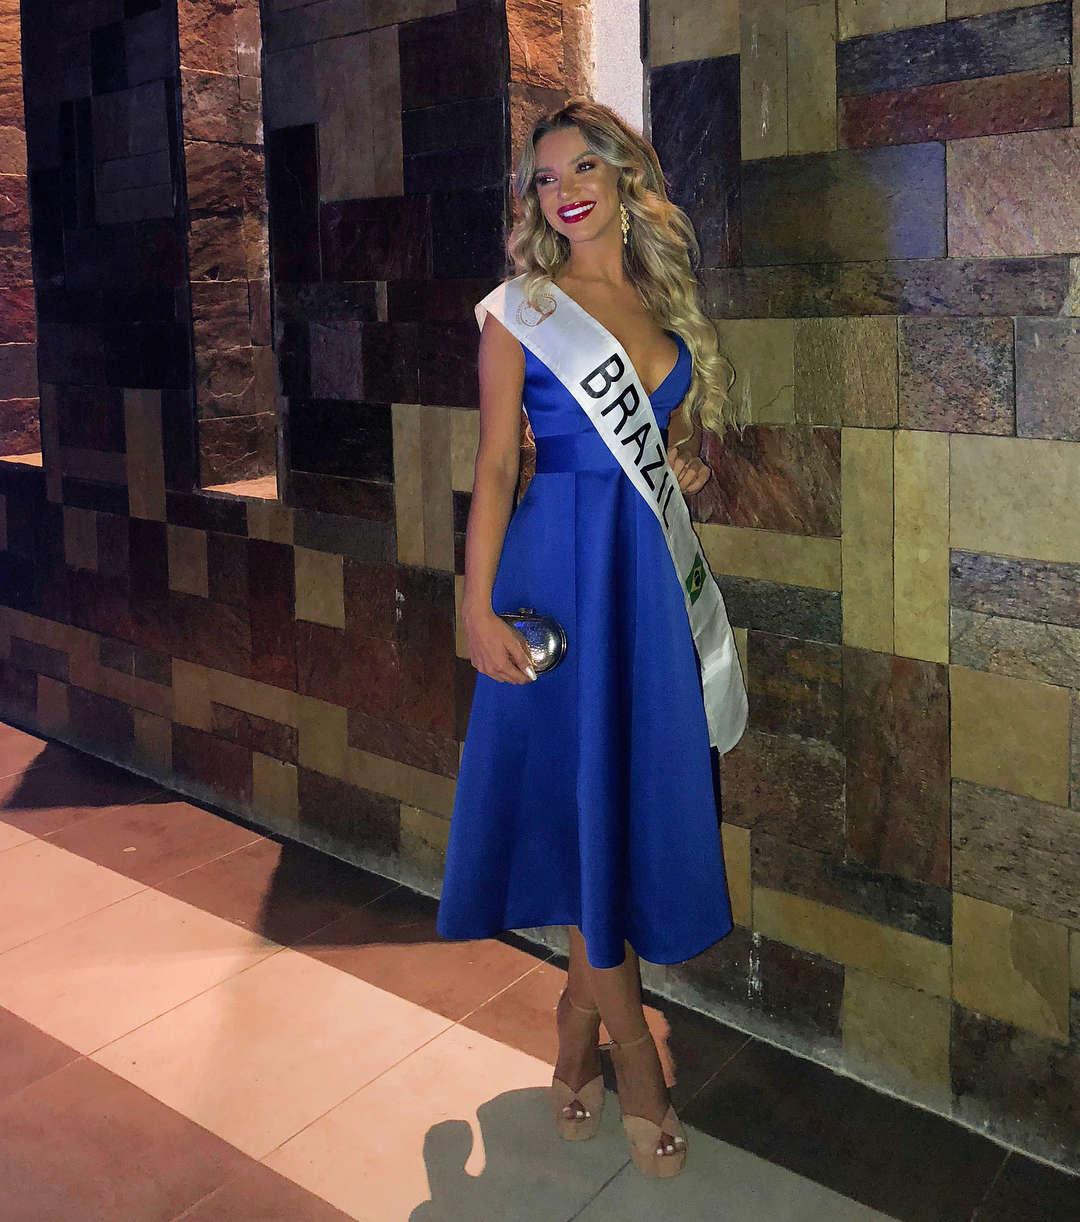 amanda cardoso, miss grand espirito santo 2019/3rd runner-up de miss intercontinental 2017. - Página 5 26073711